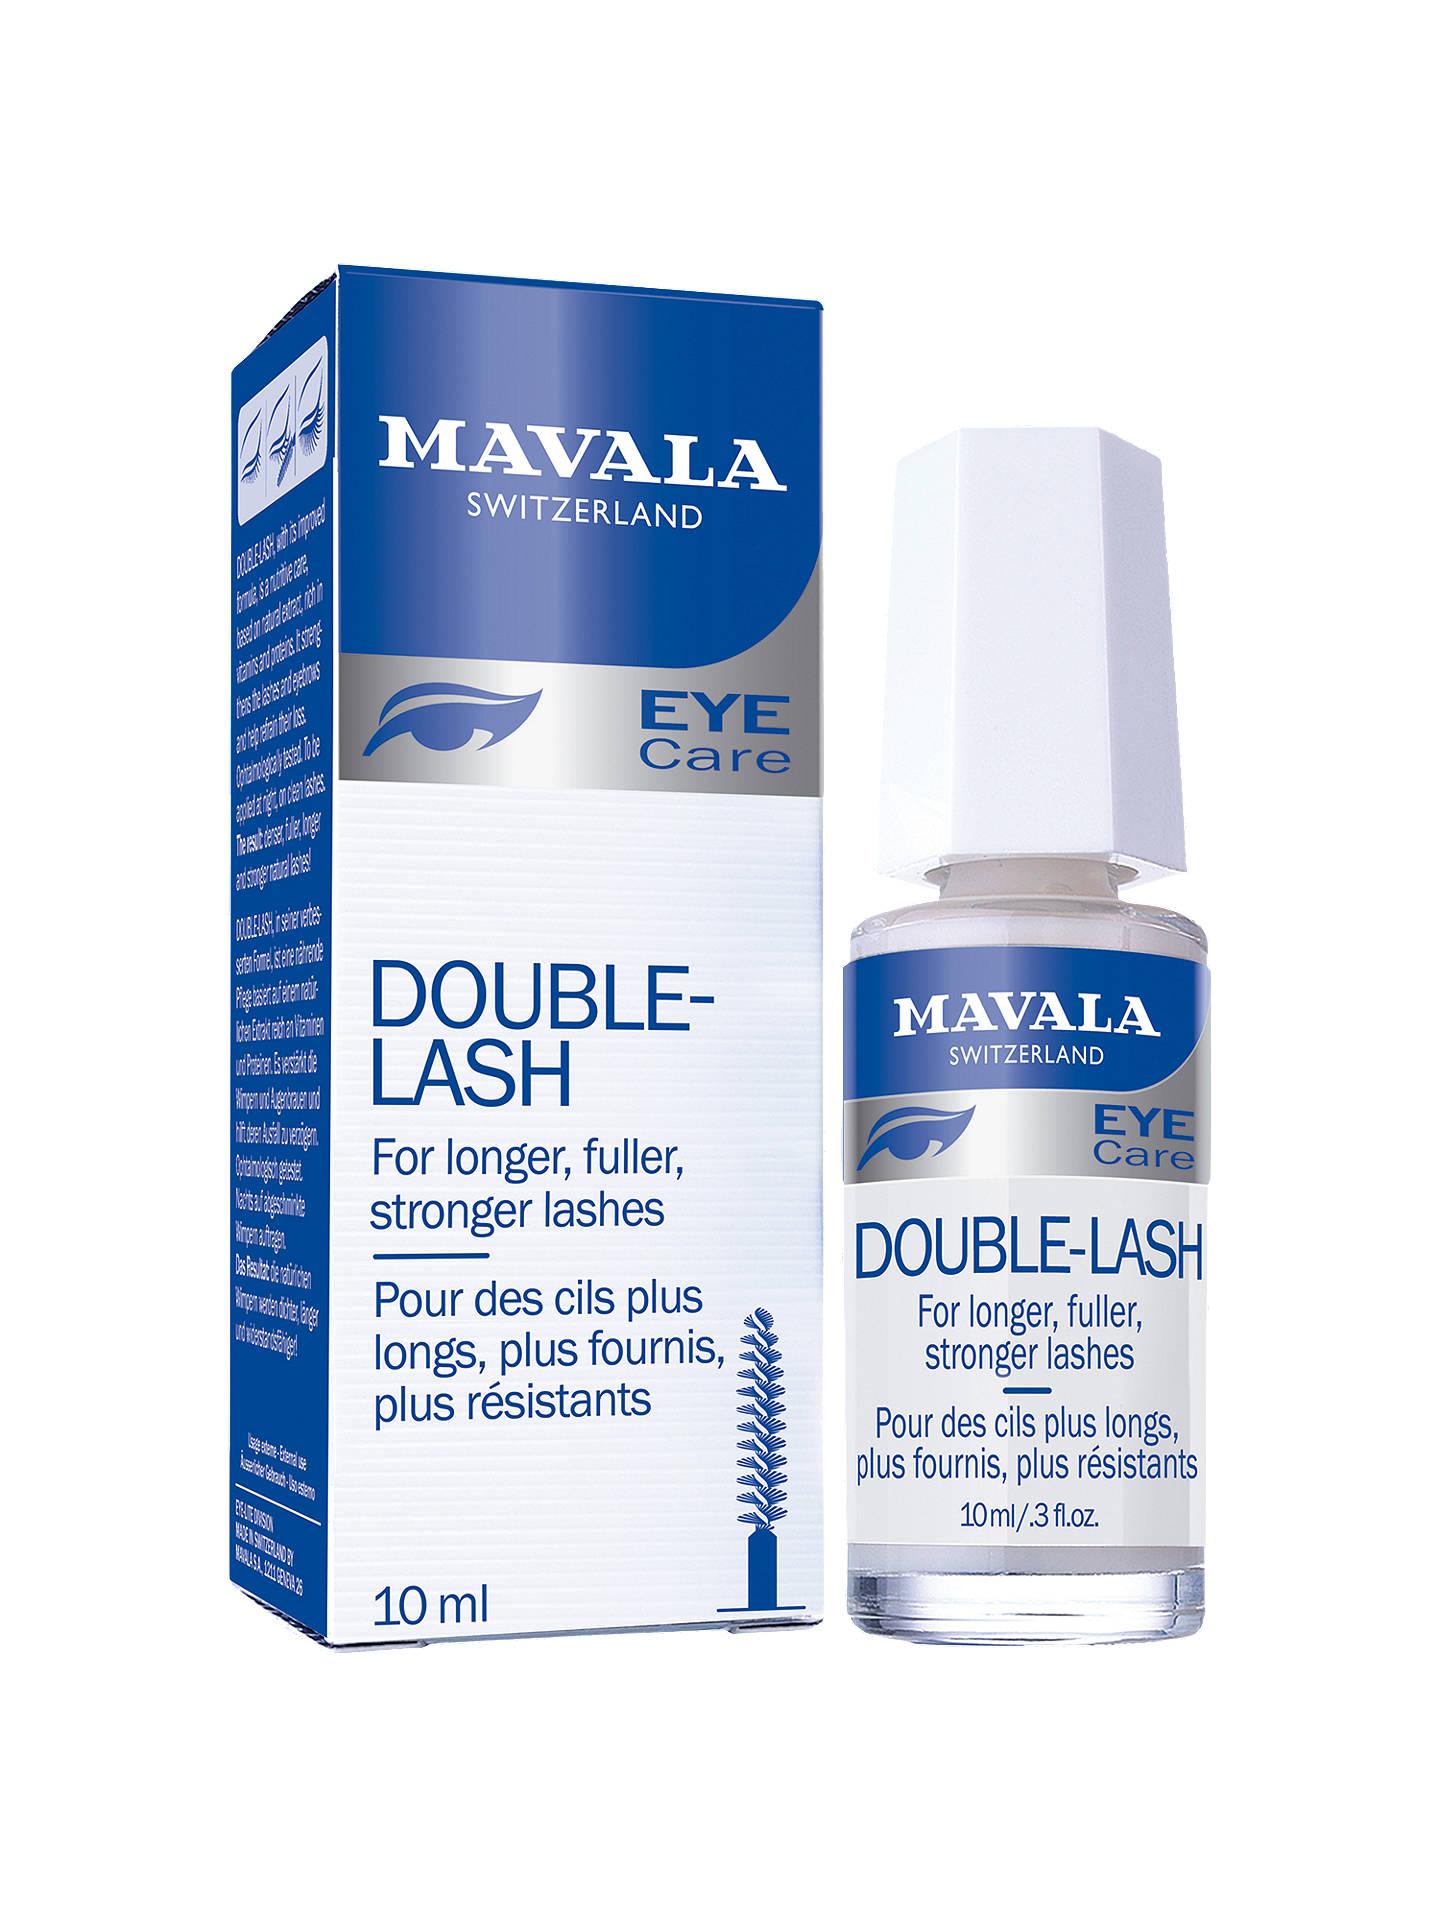 2340ad2abca Buy MAVALA Eye-Lite Double Lash, 10ml Online at johnlewis.com ...